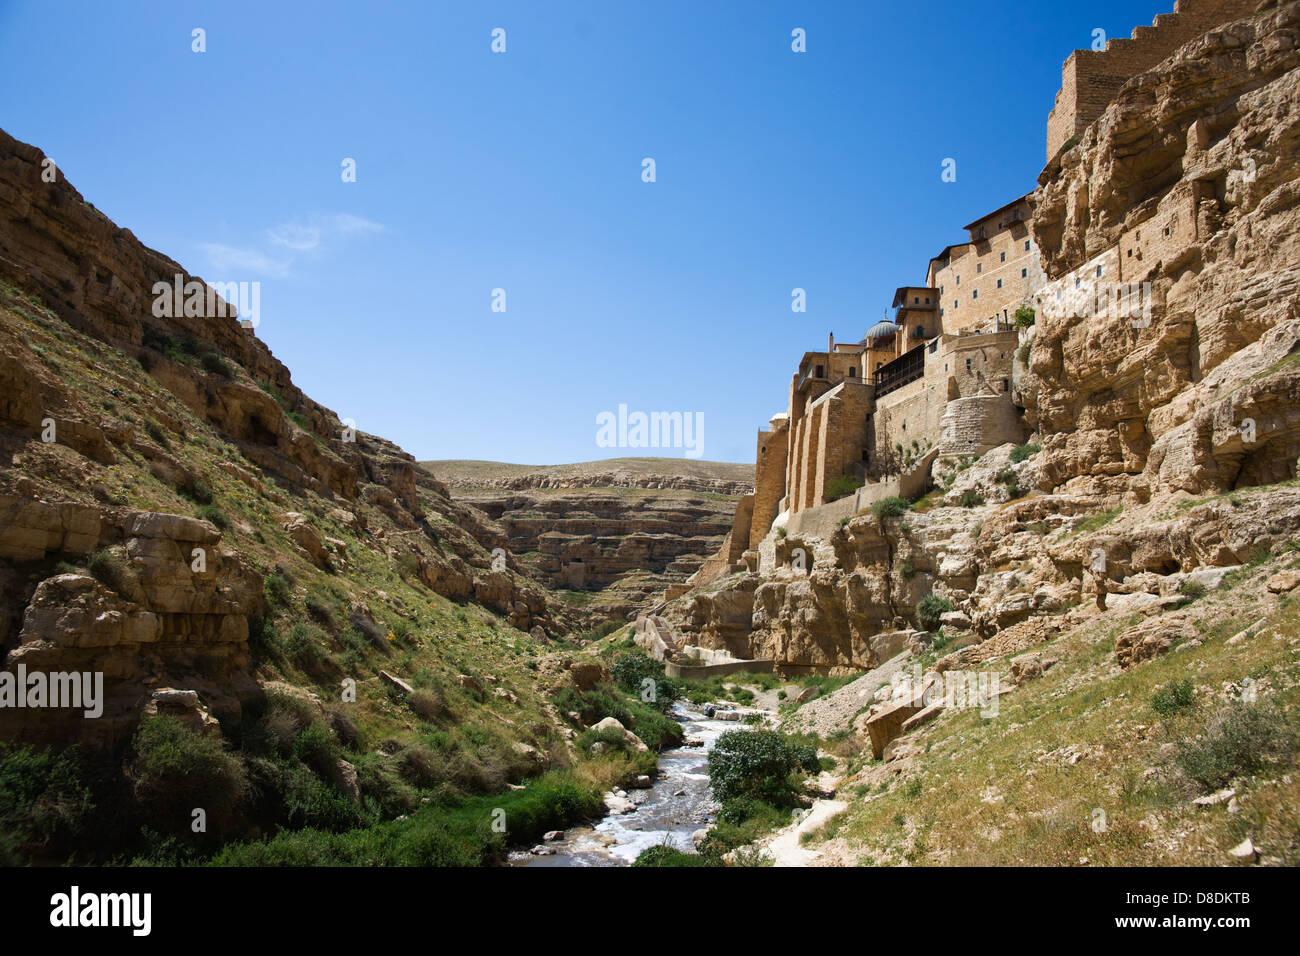 Great Lavra of St. Sabbas the Sanctified (Mar Saba)  Greek Orthodox monastery, Kidron Valley, Palestine Stock Photo